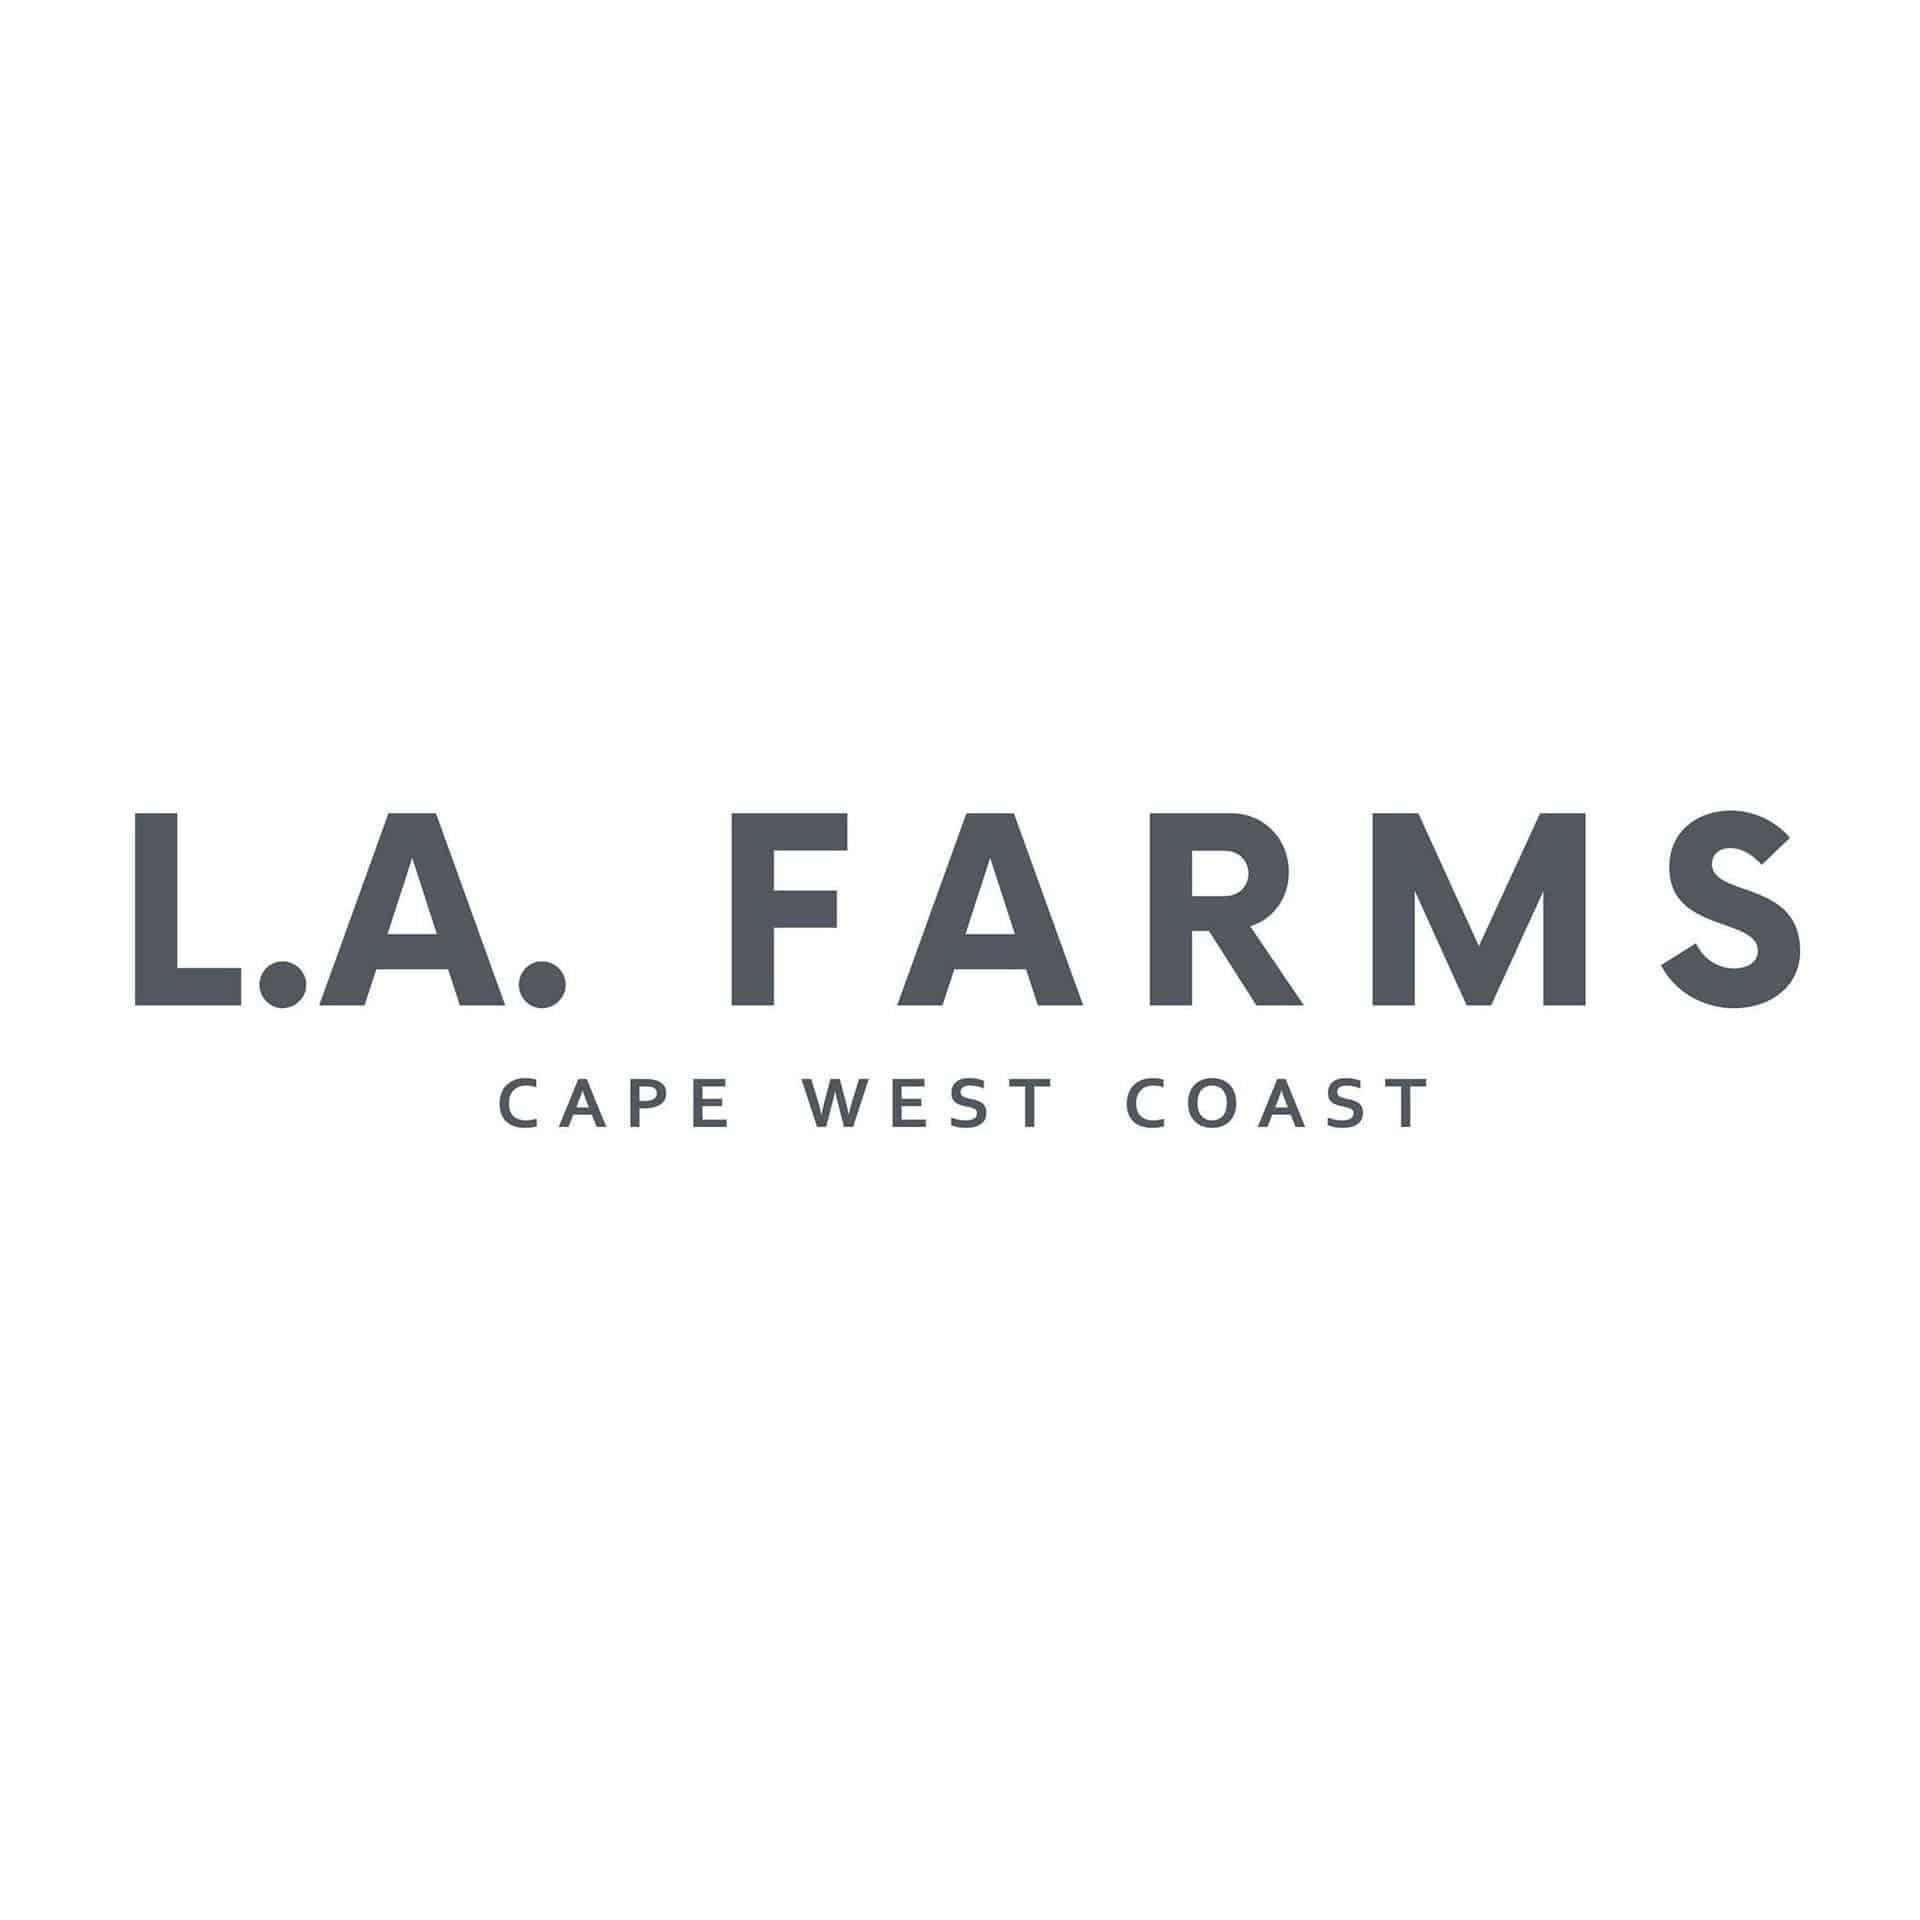 L.A. Farms